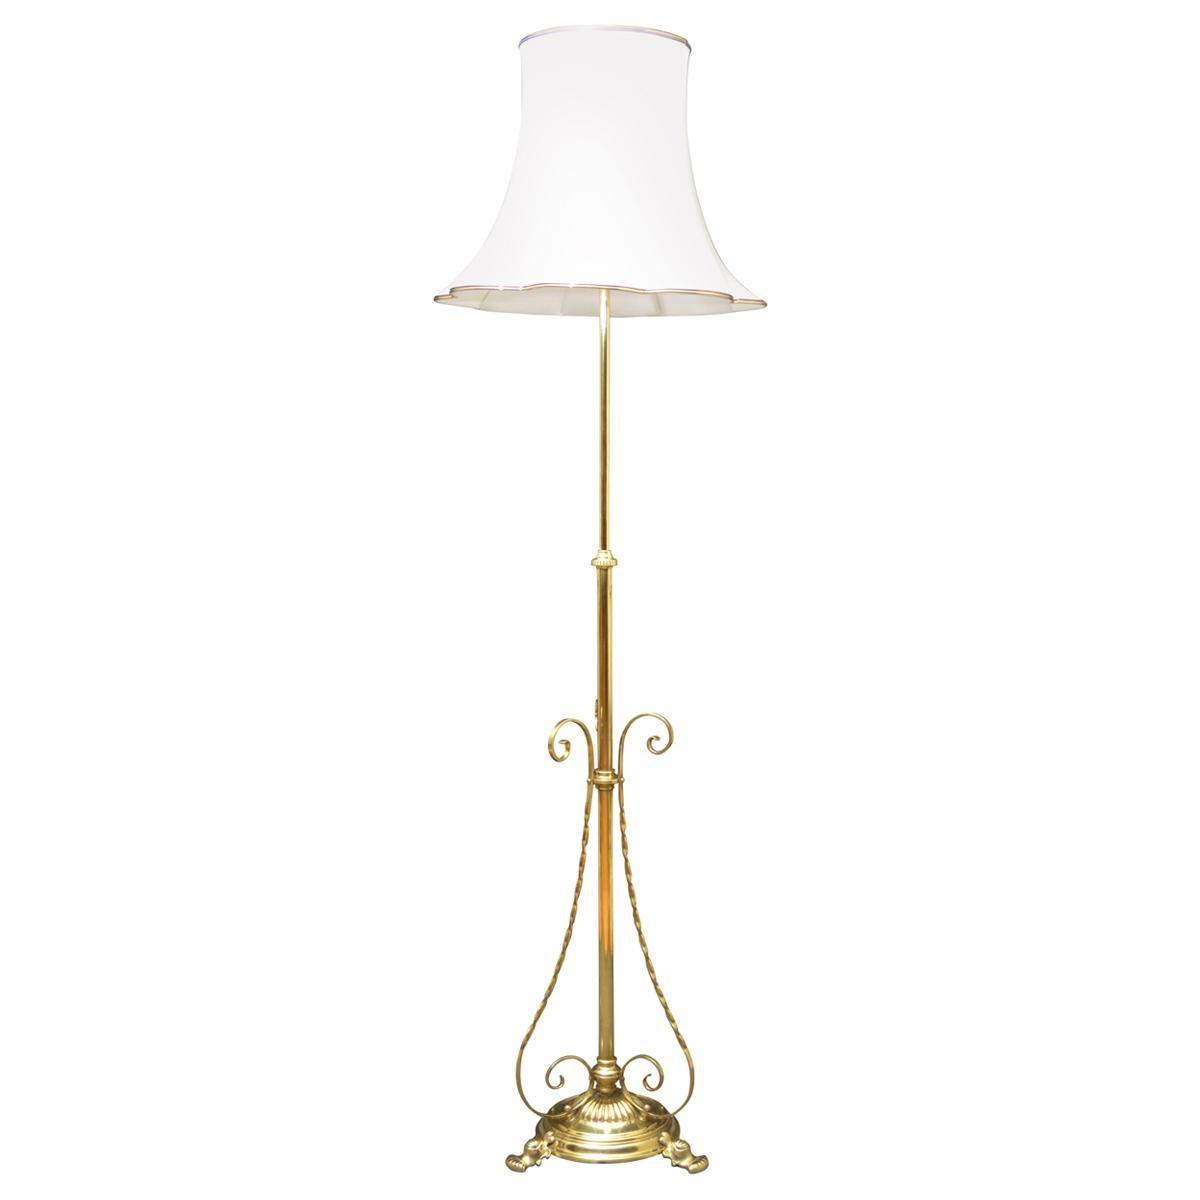 Arts & Crafts Brass Floor Lamp